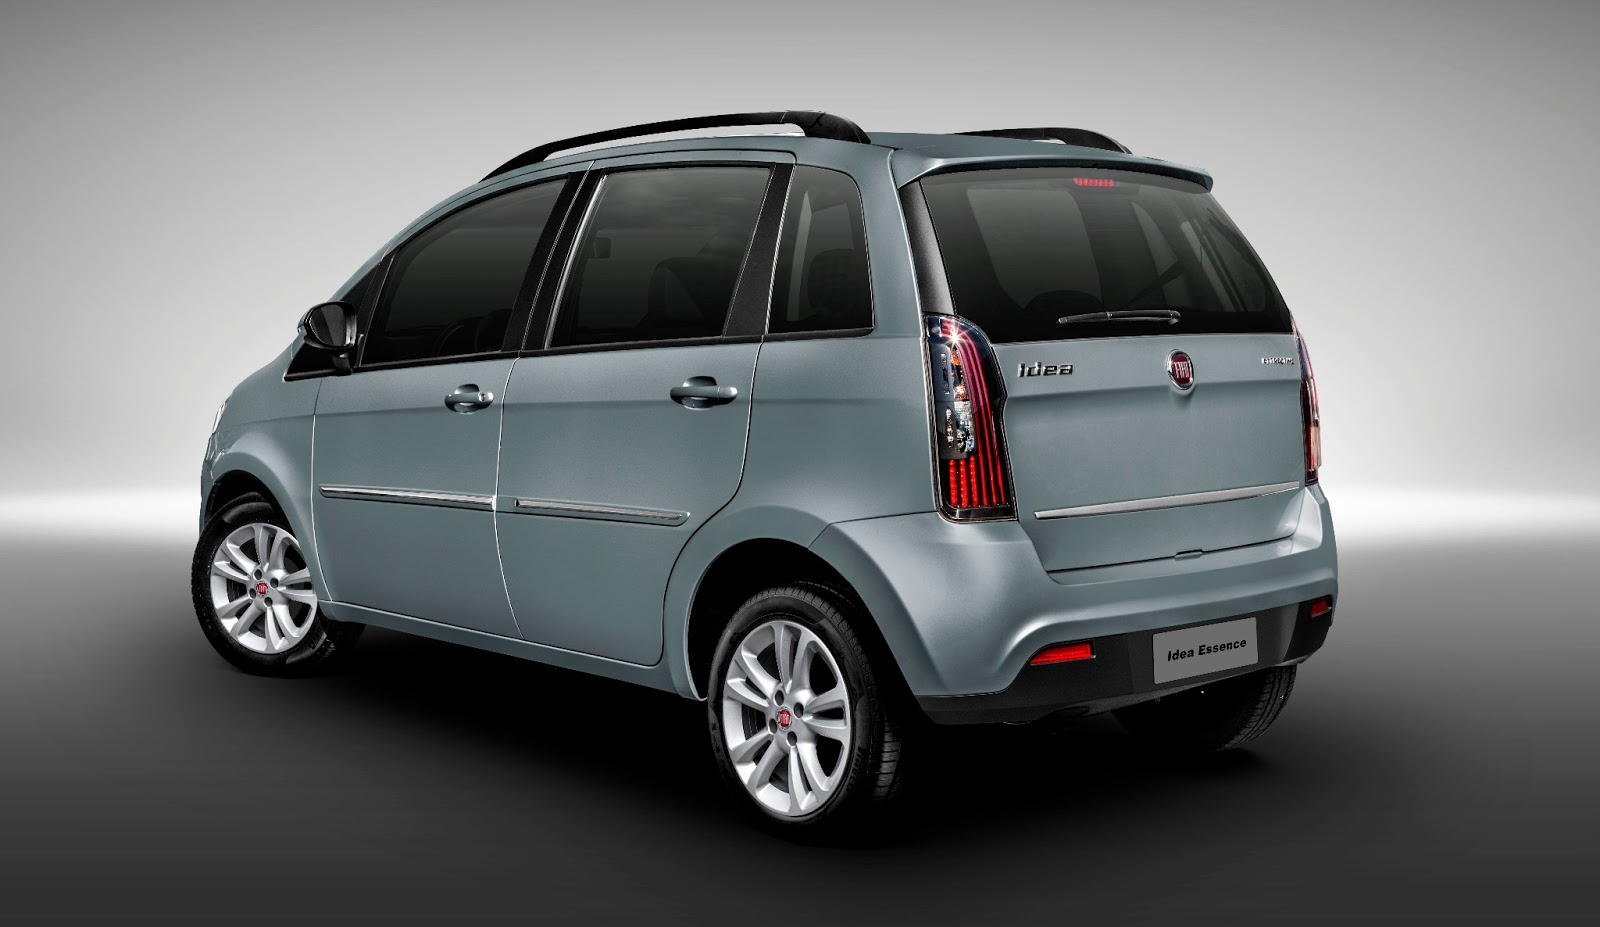 Auto REALIDADE: Fiat Idea recebe novidades na linha 2014